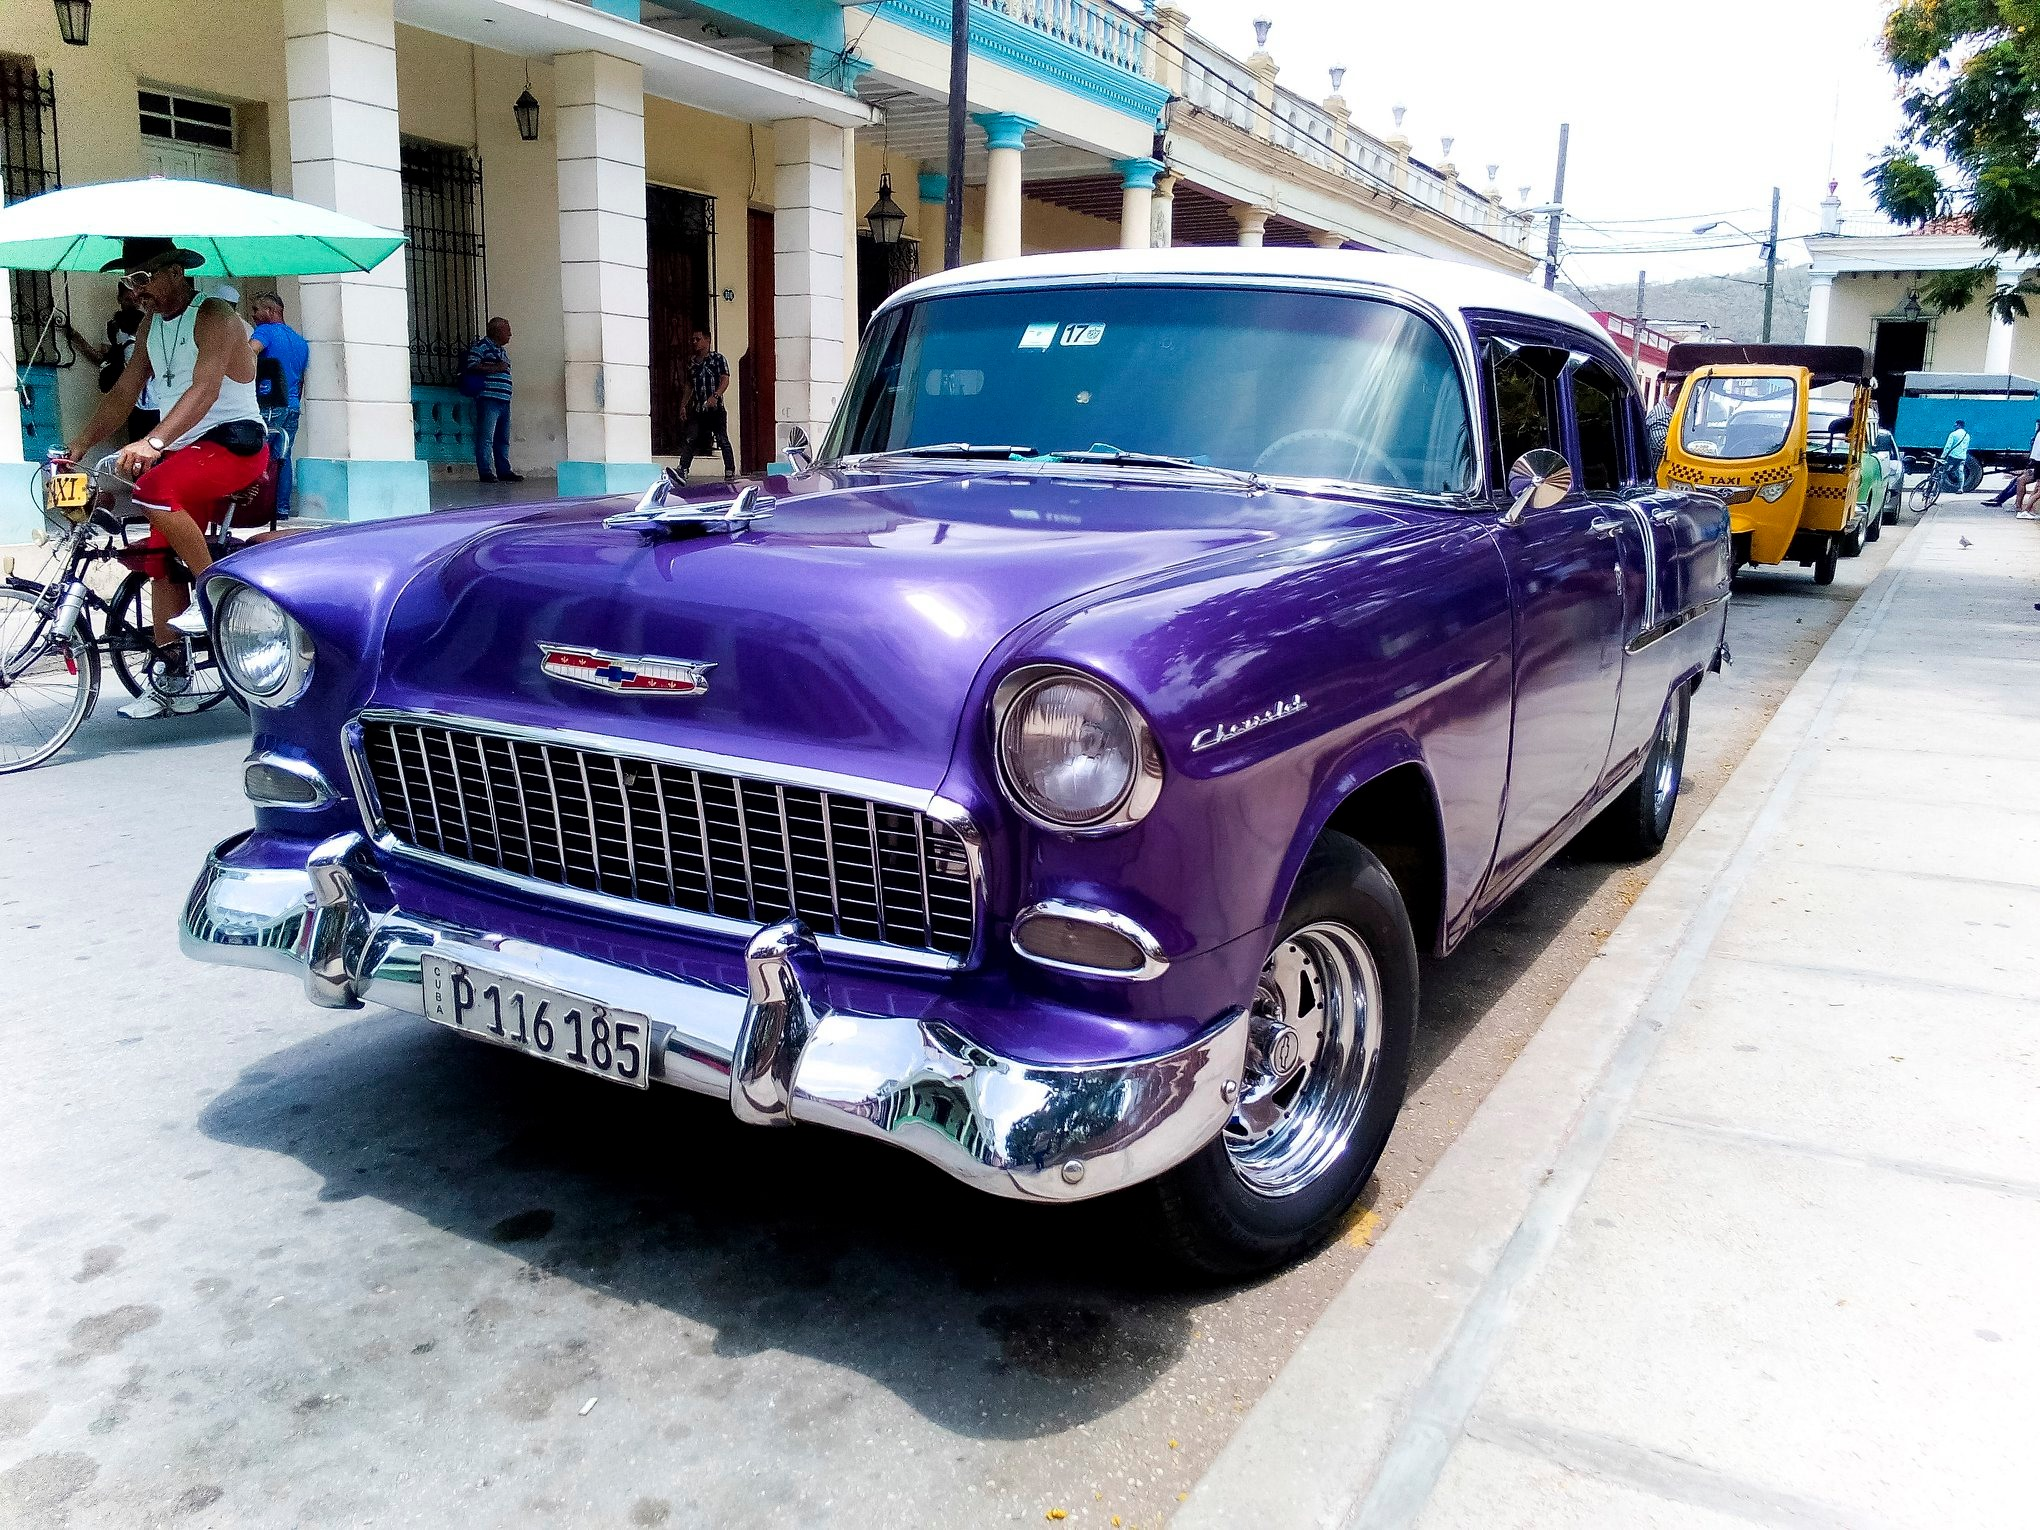 Chevy-1955-